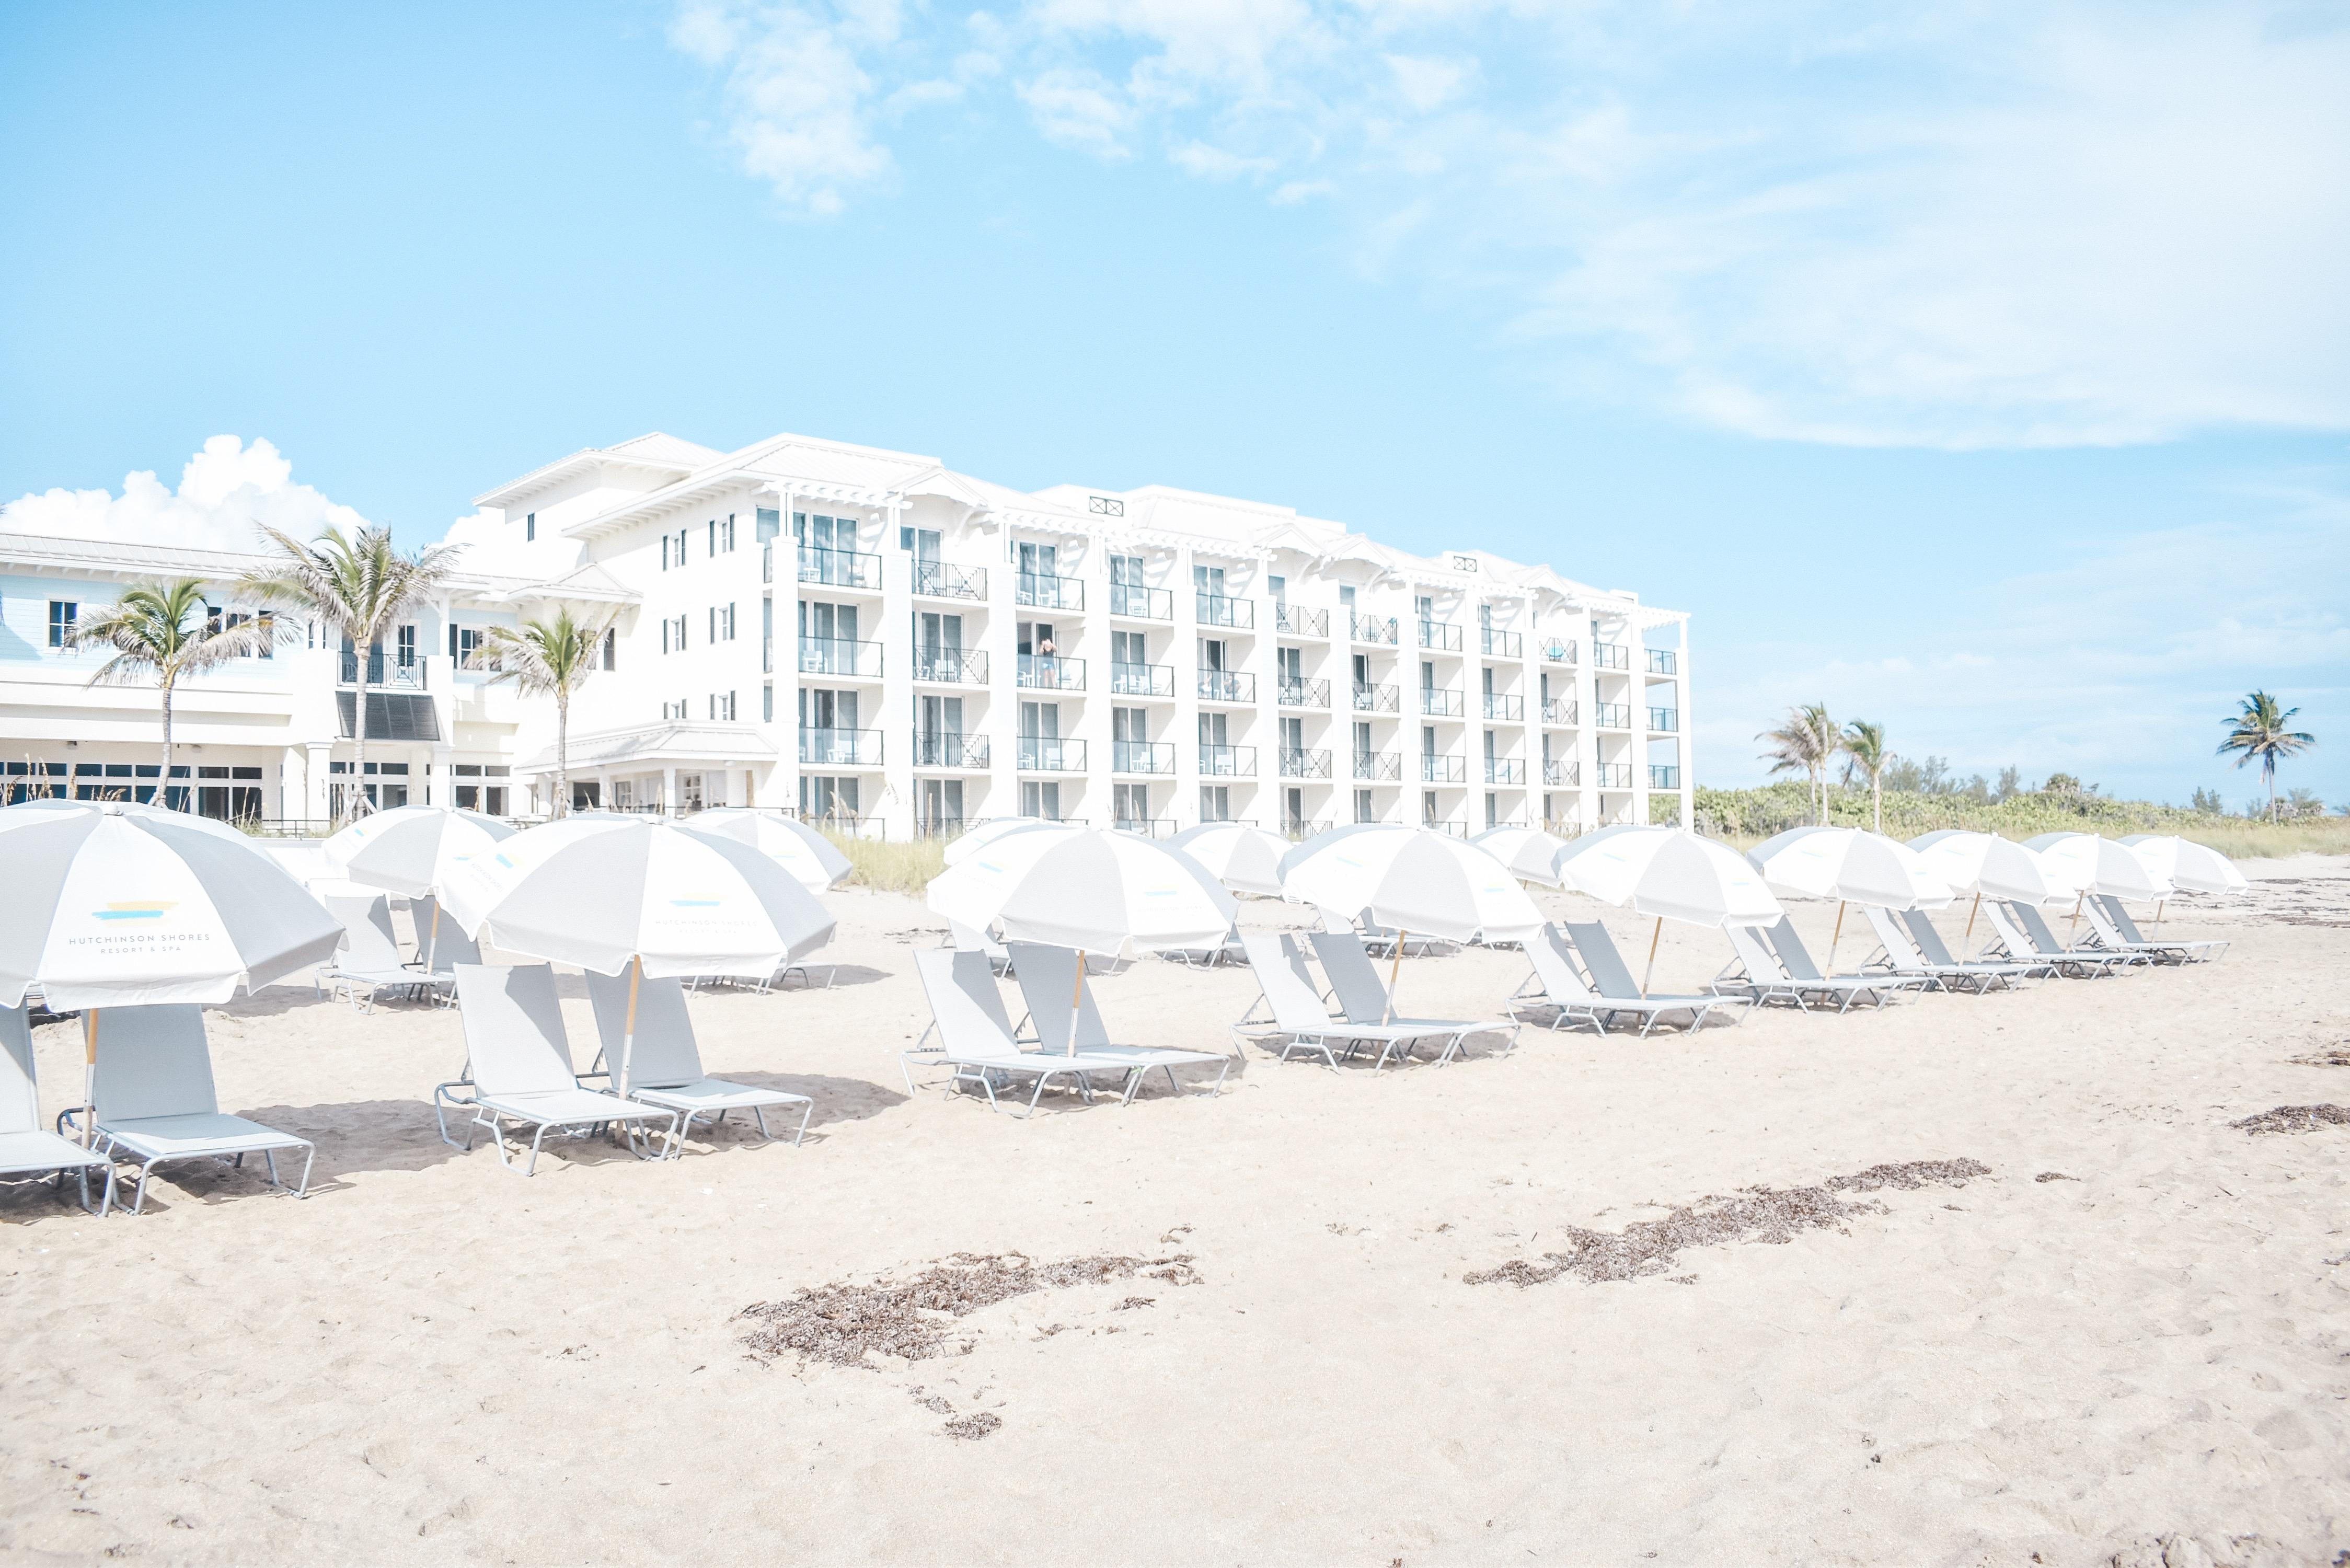 Hutchinson Shores - 30A Mama Travel - Beach Chairs and Umbrellas